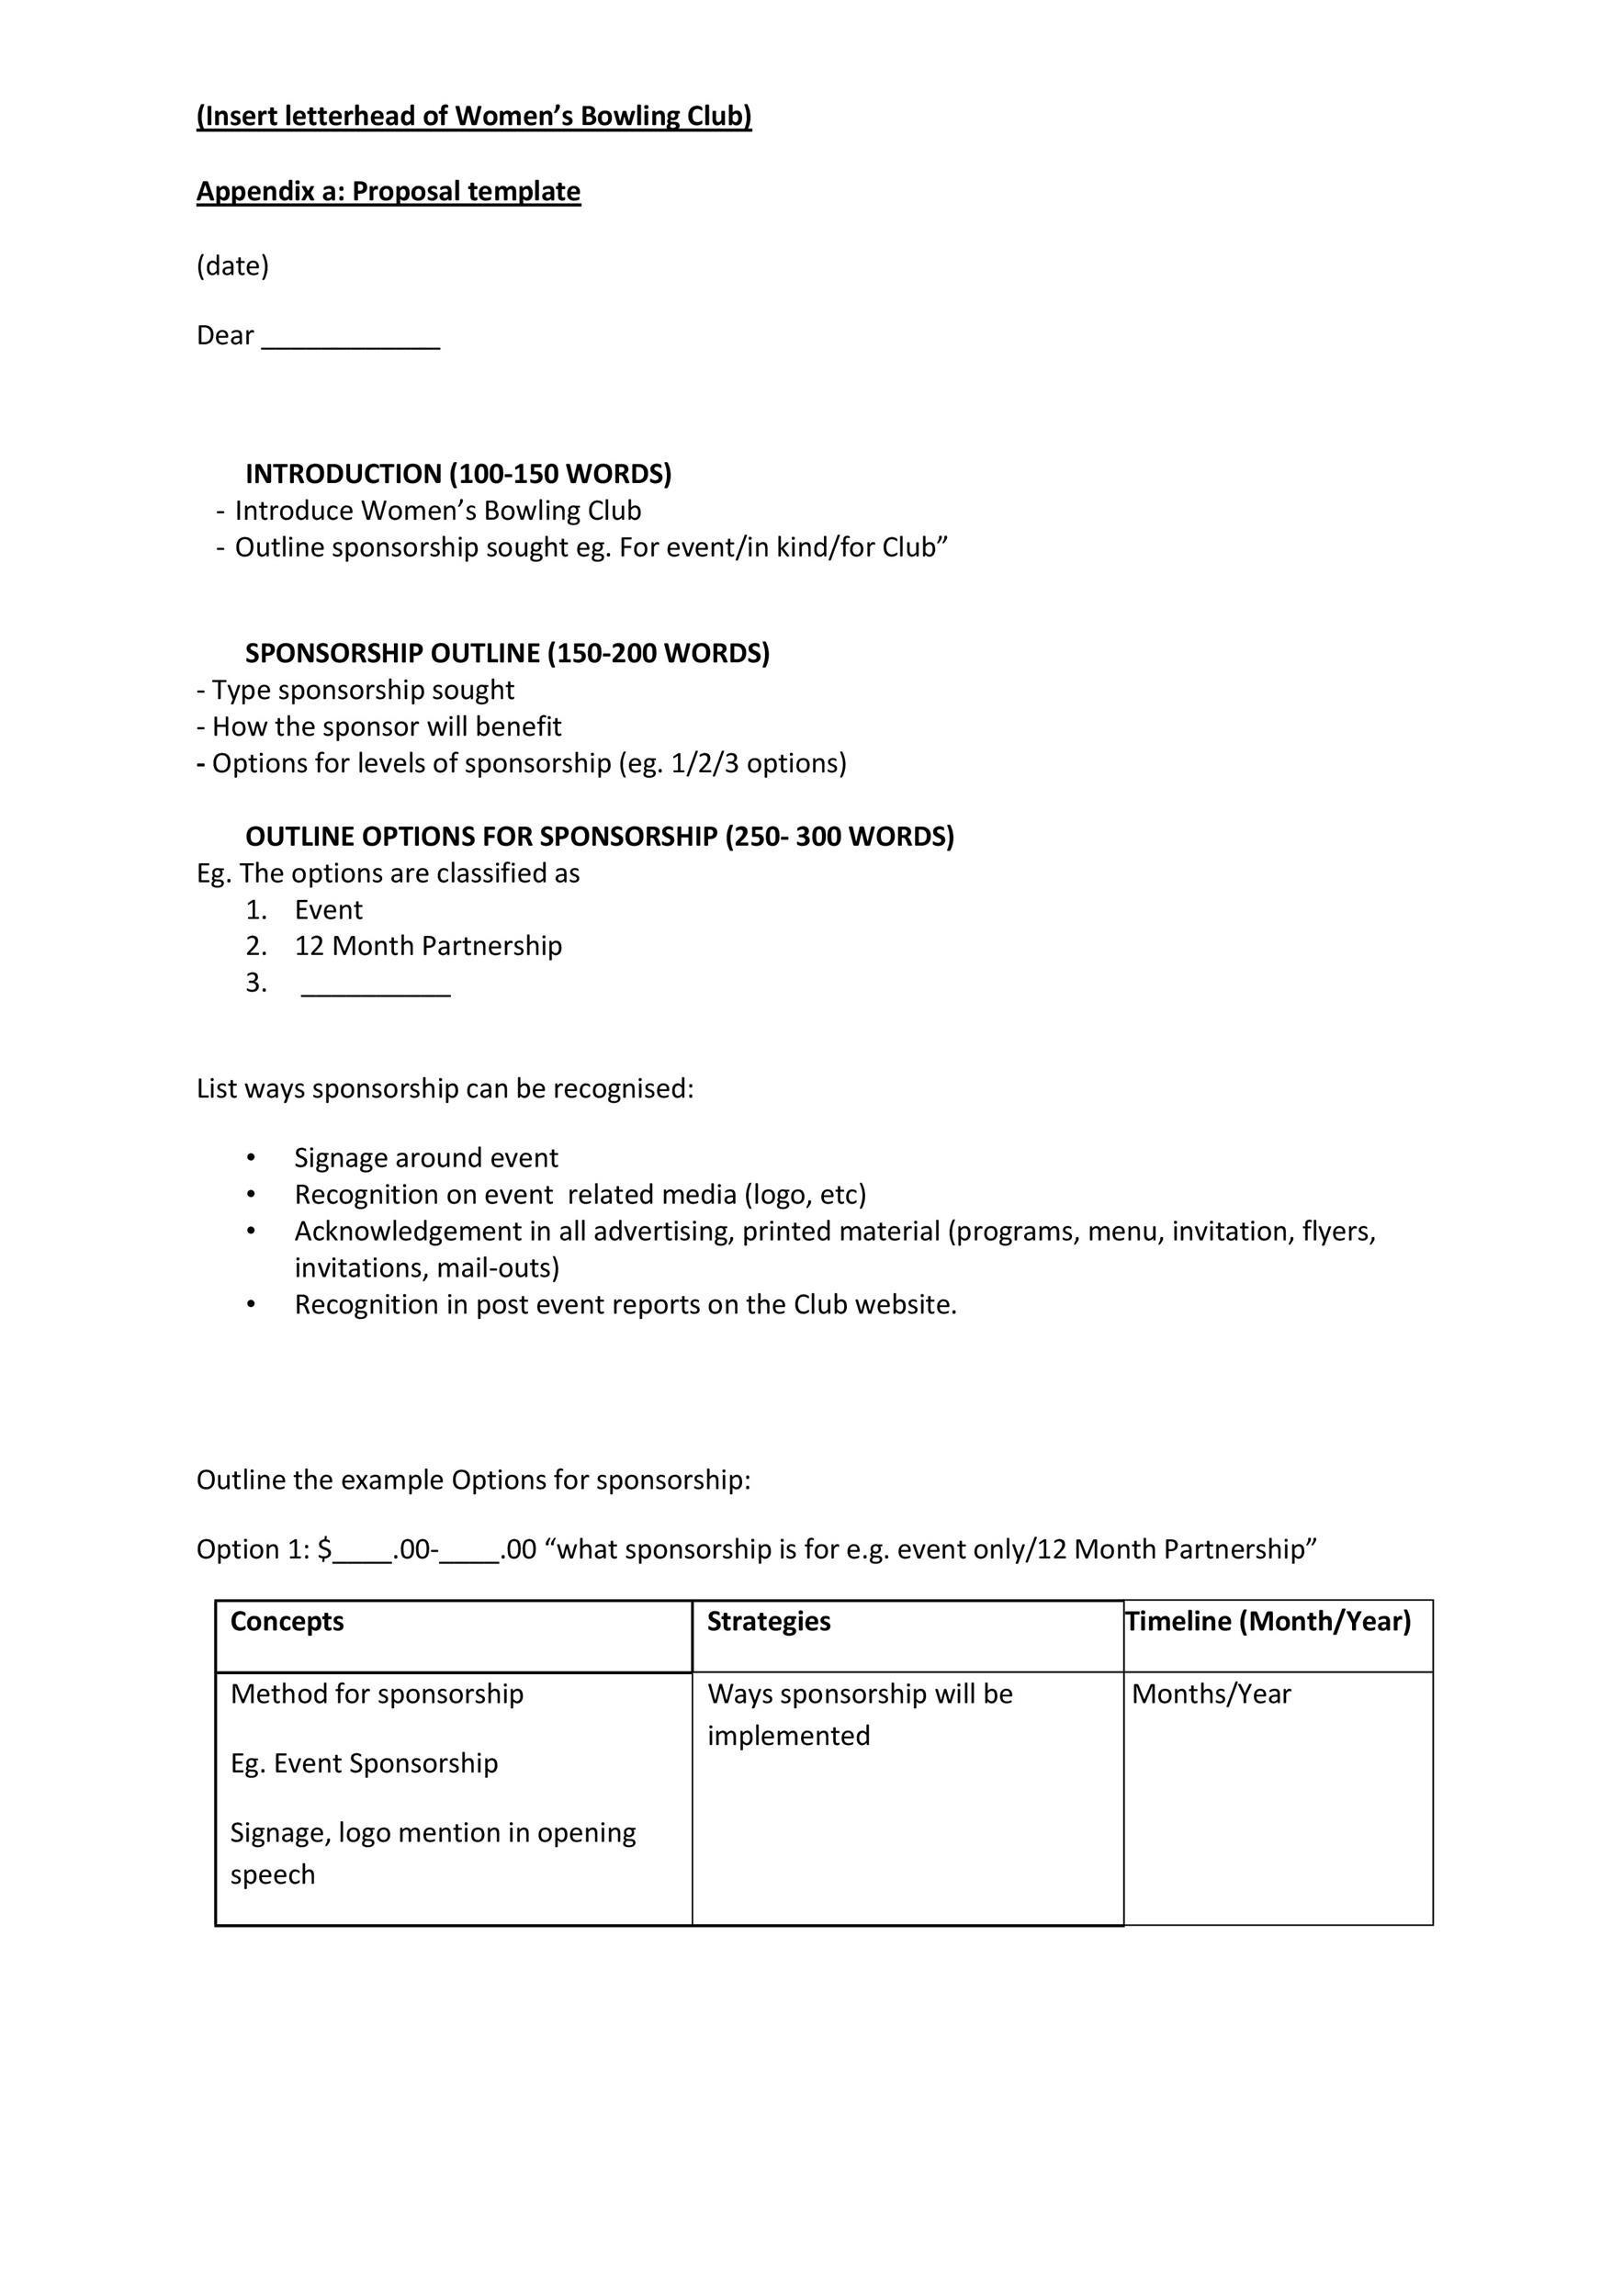 Sample Letter Seeking Sponsorship